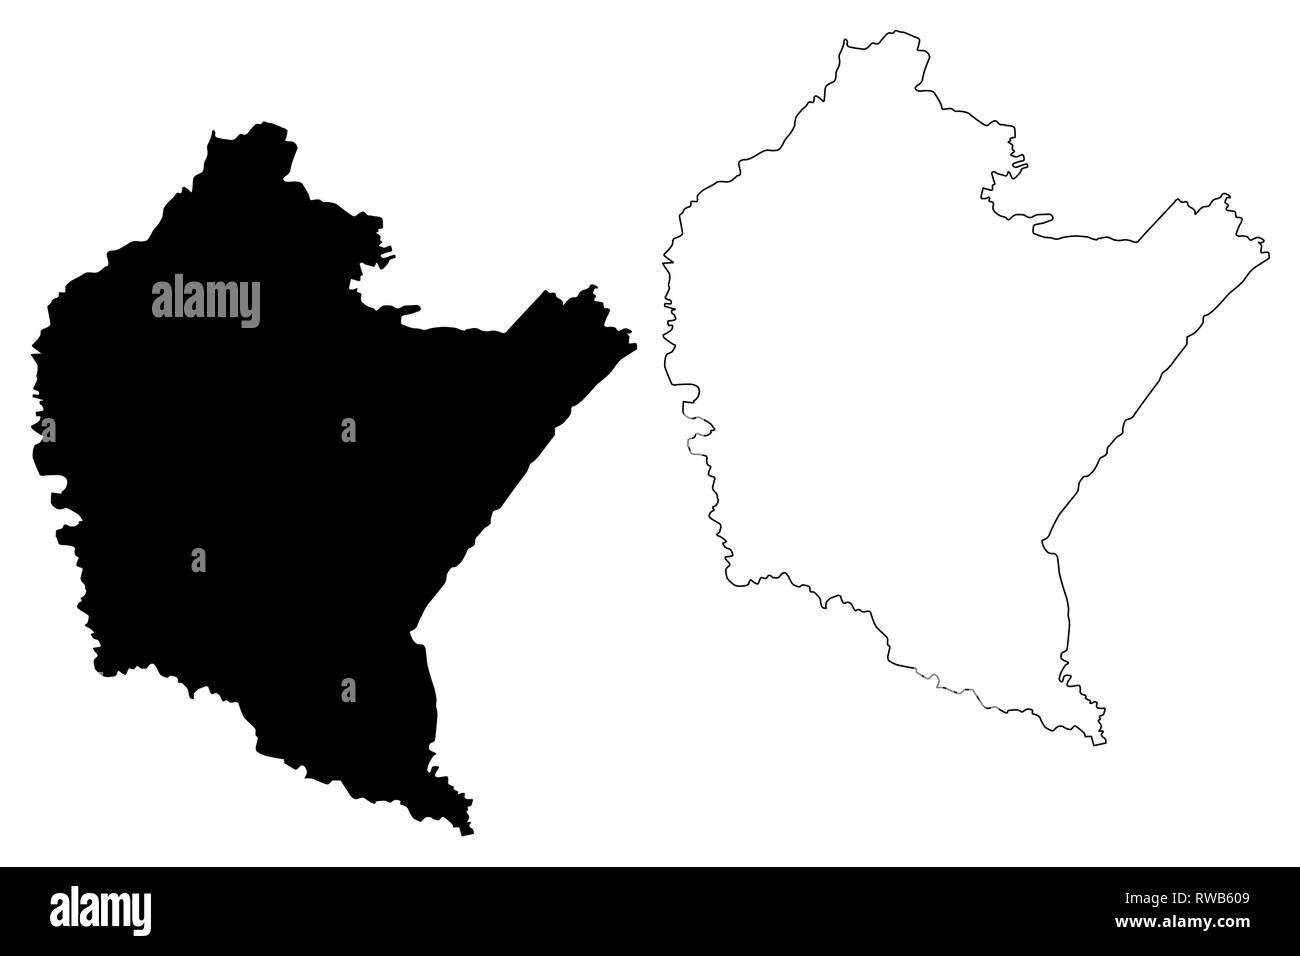 Rzeszow Poland Black And White Stock Photos Images Alamy